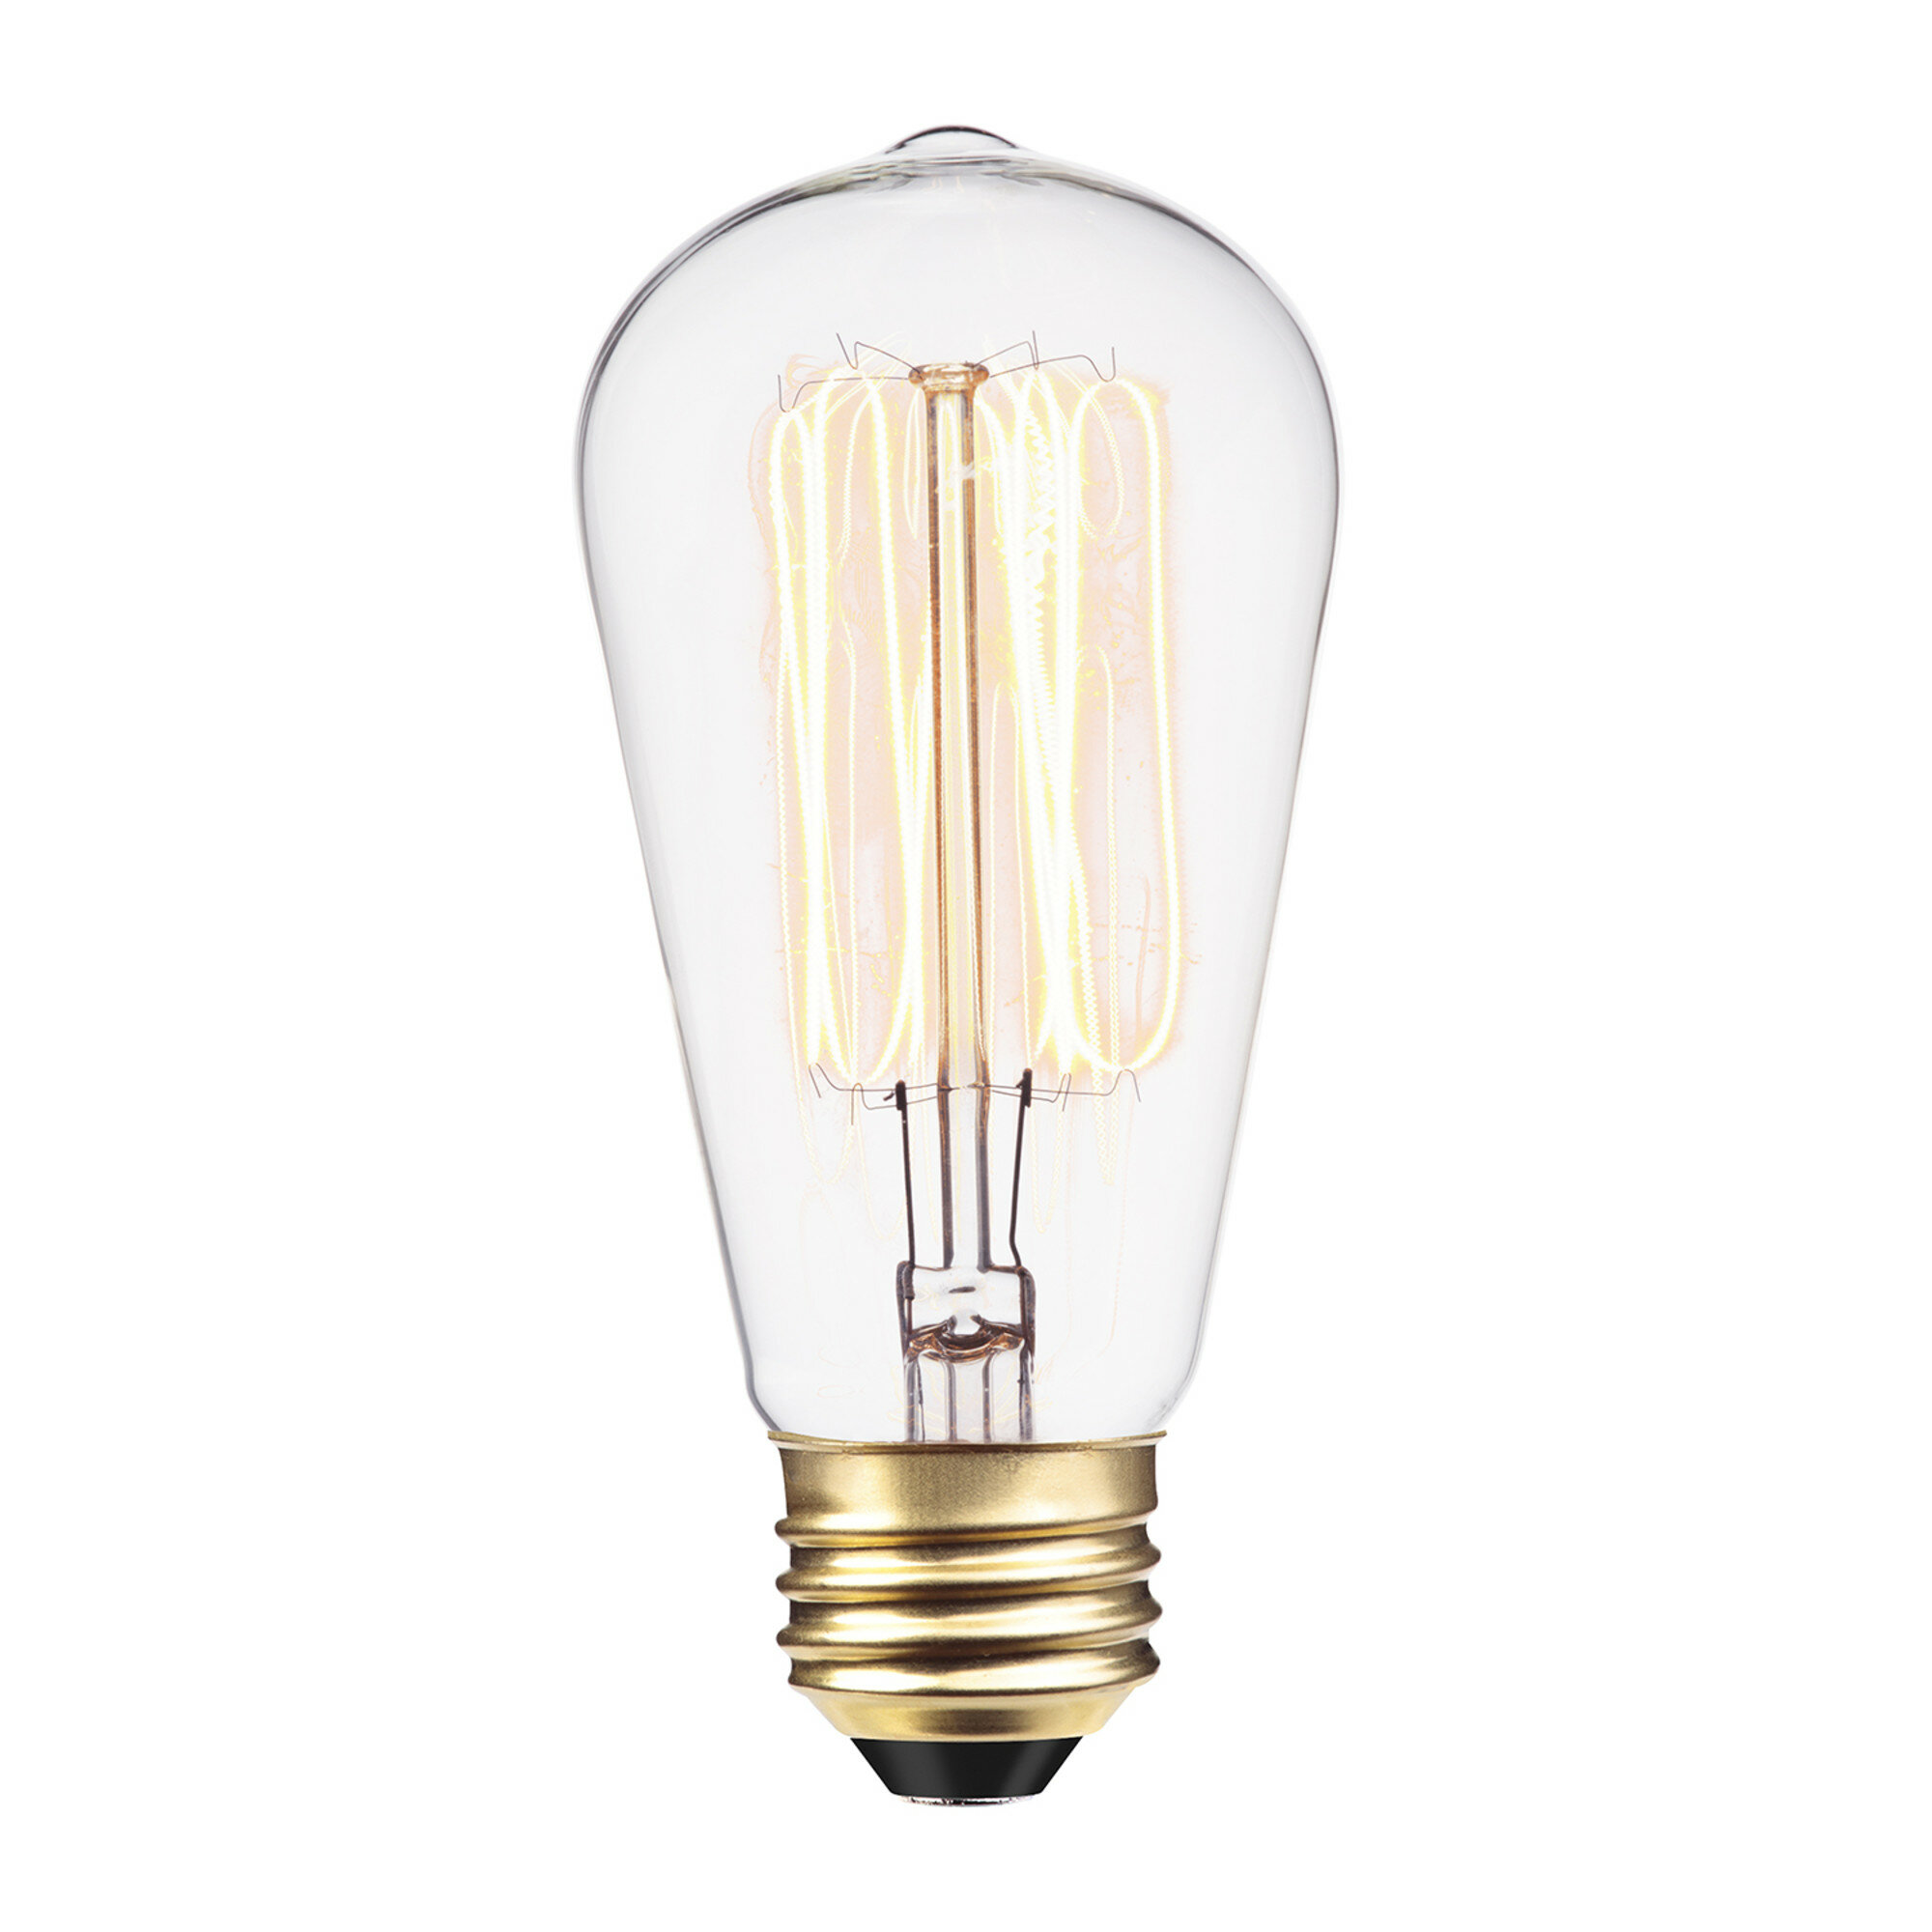 01324 40 Watt A19 Incandescent Dimmable Light Bulb Warm White 2700k E26 Base